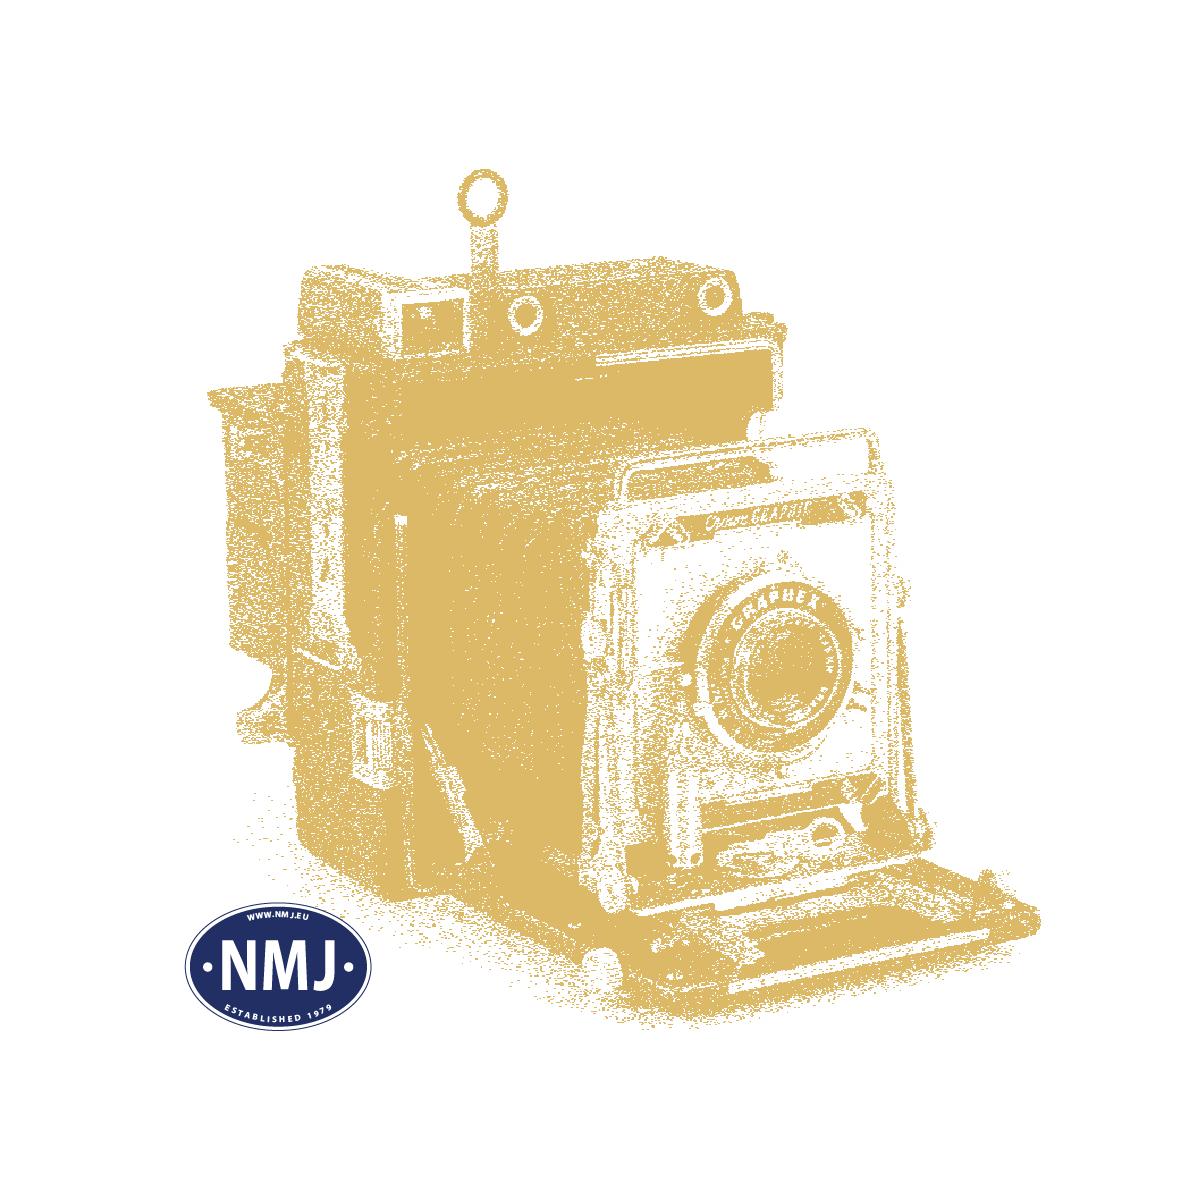 NMJT199.103 - NMJ Topline Standing Passengers, Set #1